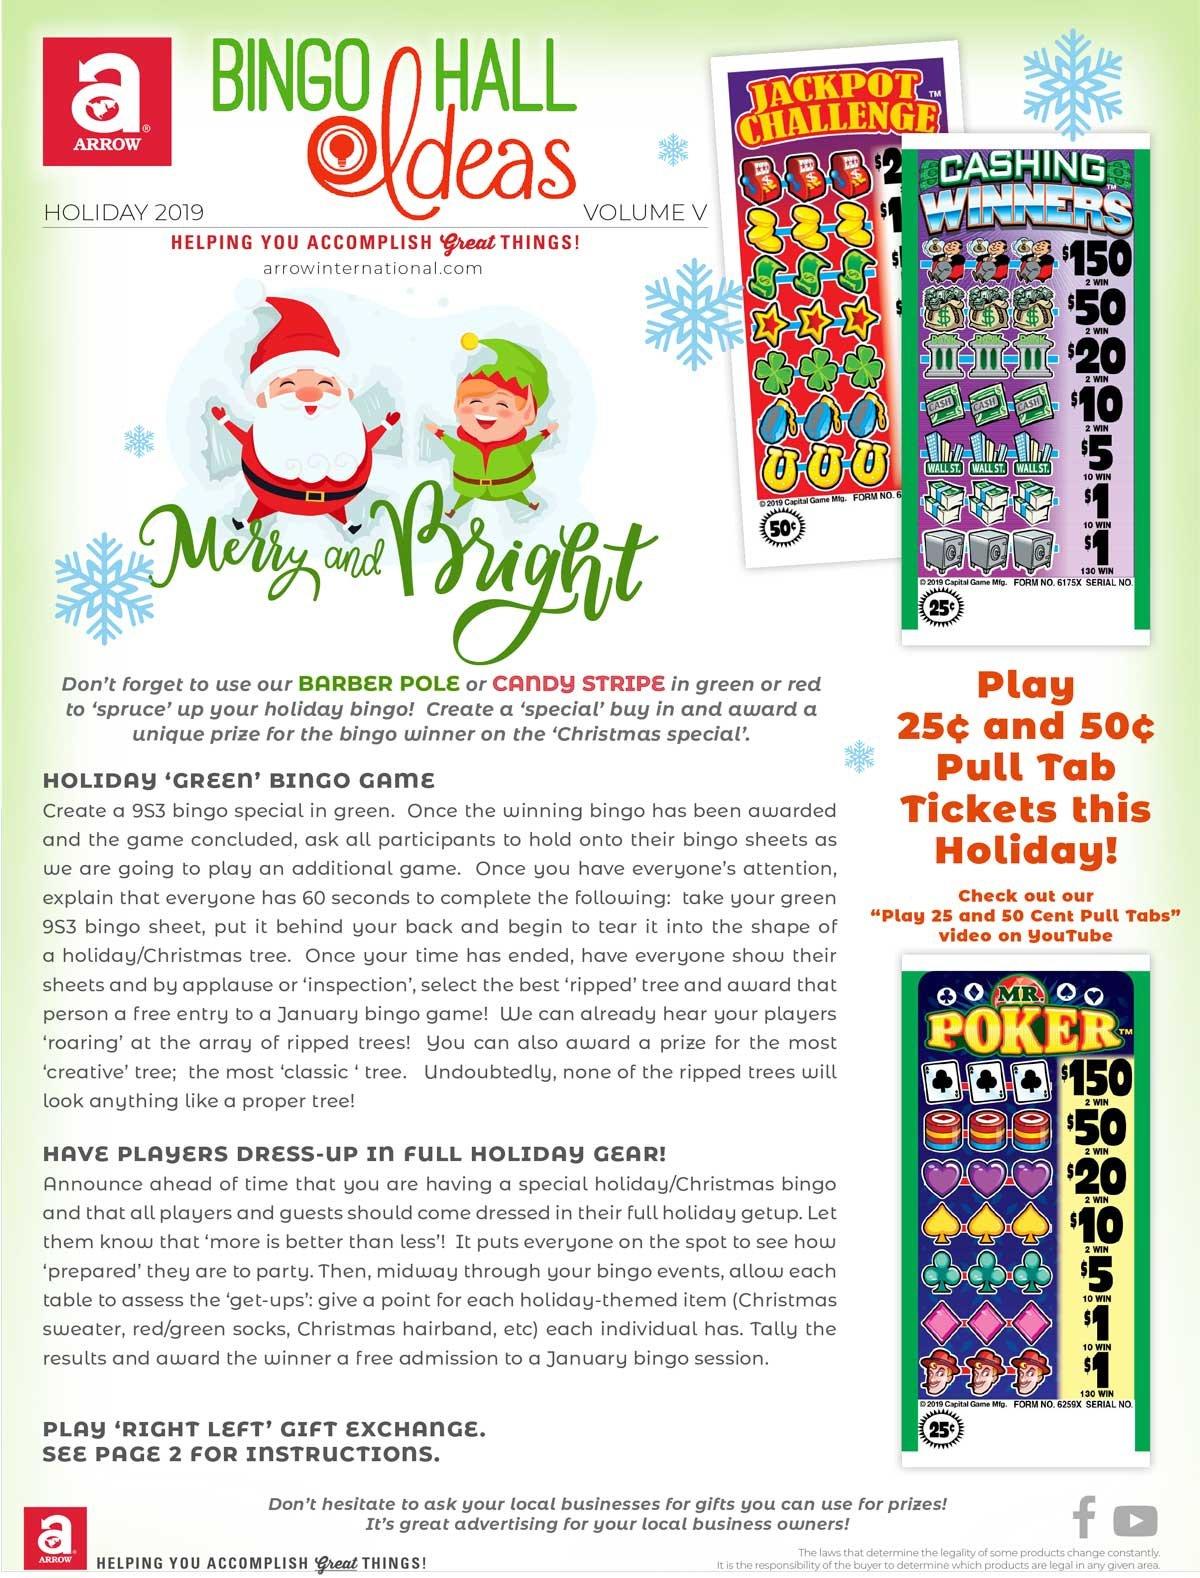 Bingo-Hall-Ideas-Holiday2019-1